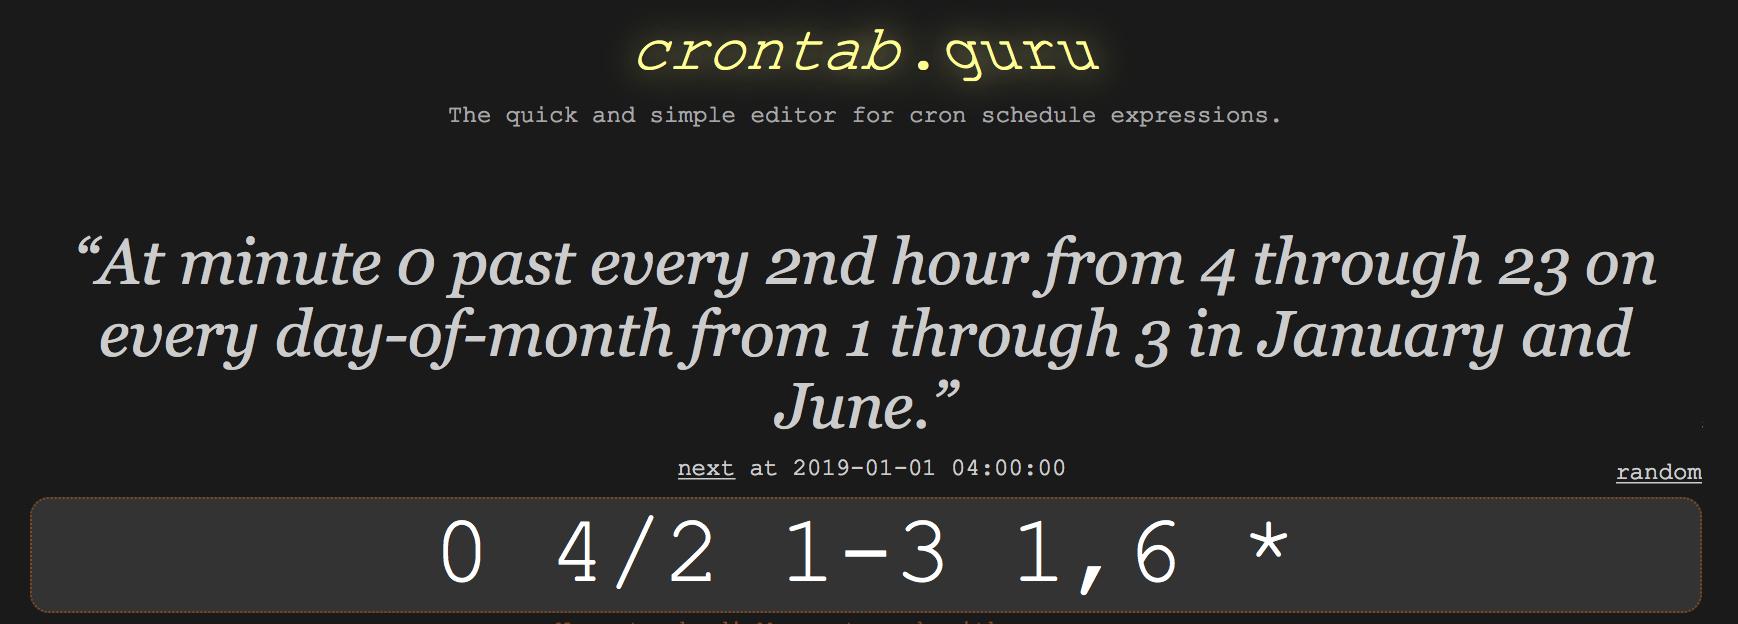 Simplify your crontab entries with crontab guru